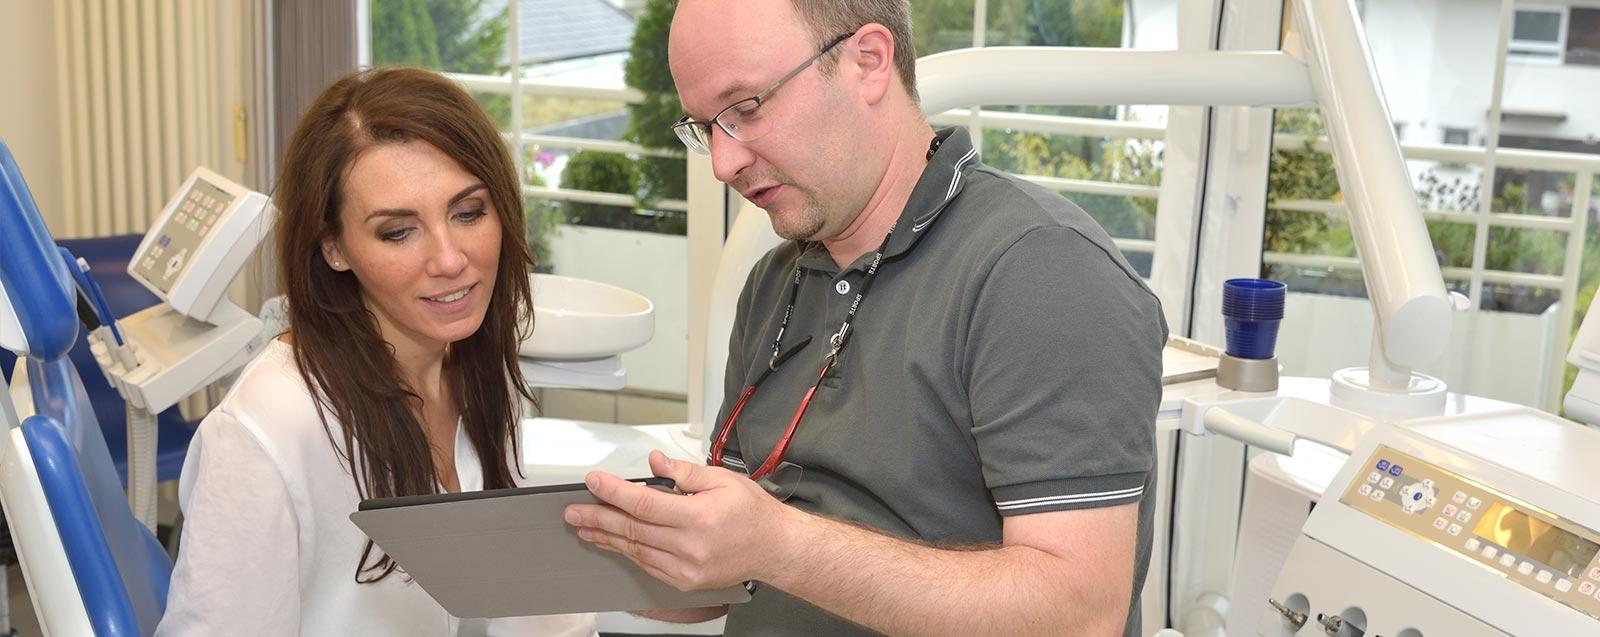 Zertifizierungen Zahnarzt Dominik Meling